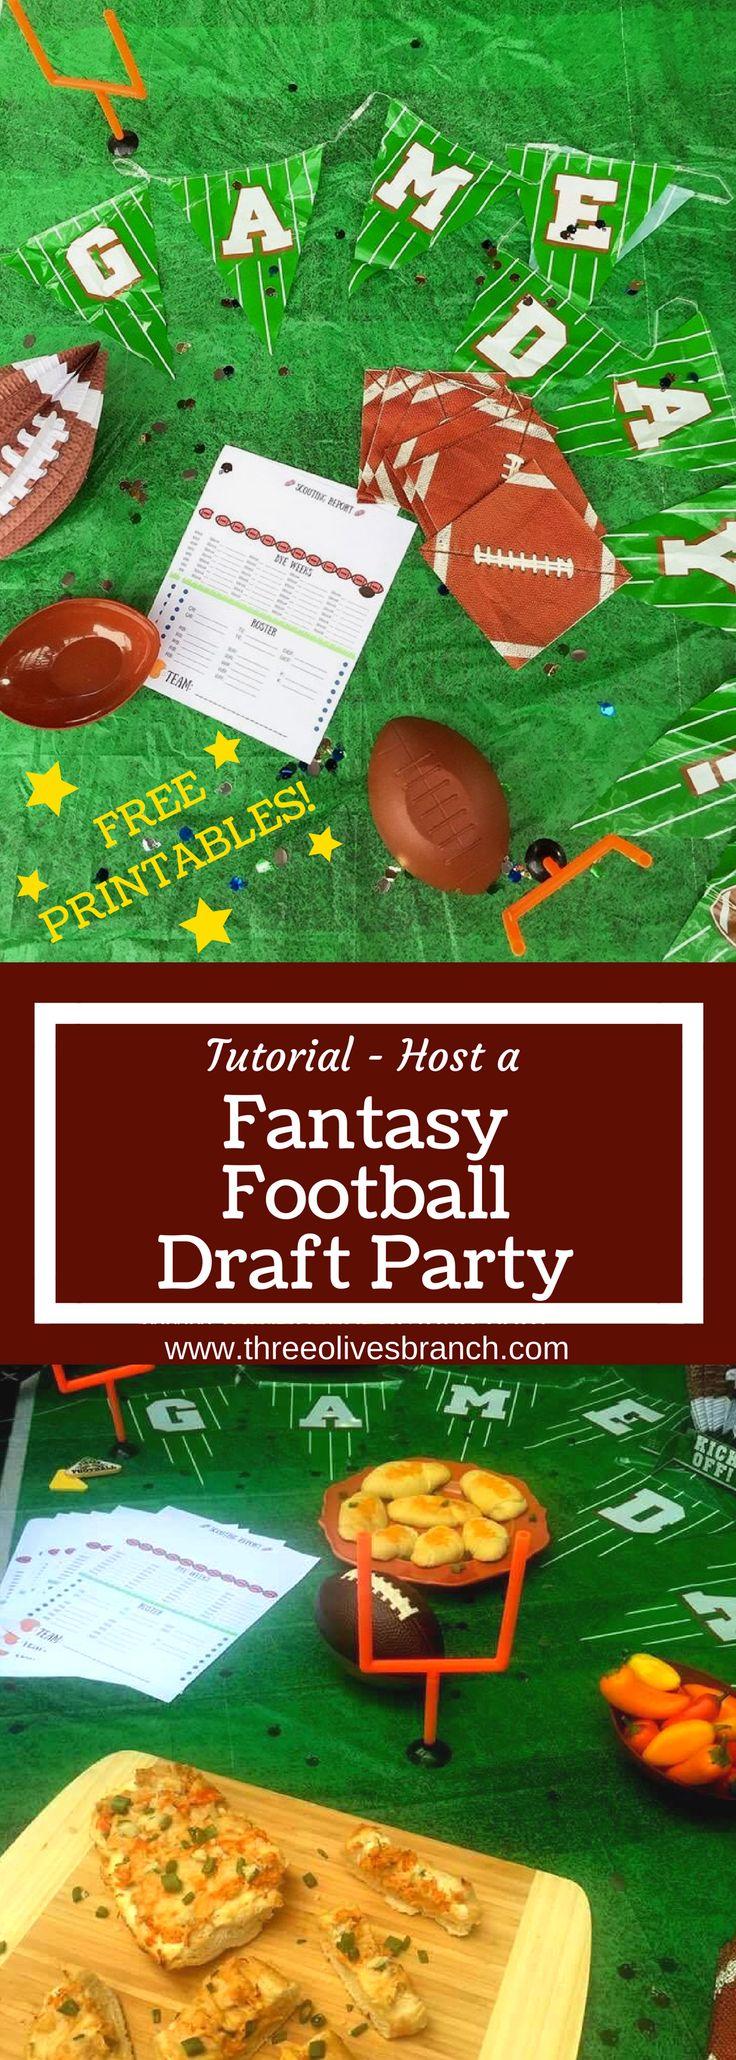 Fantasy football draft pussy 6